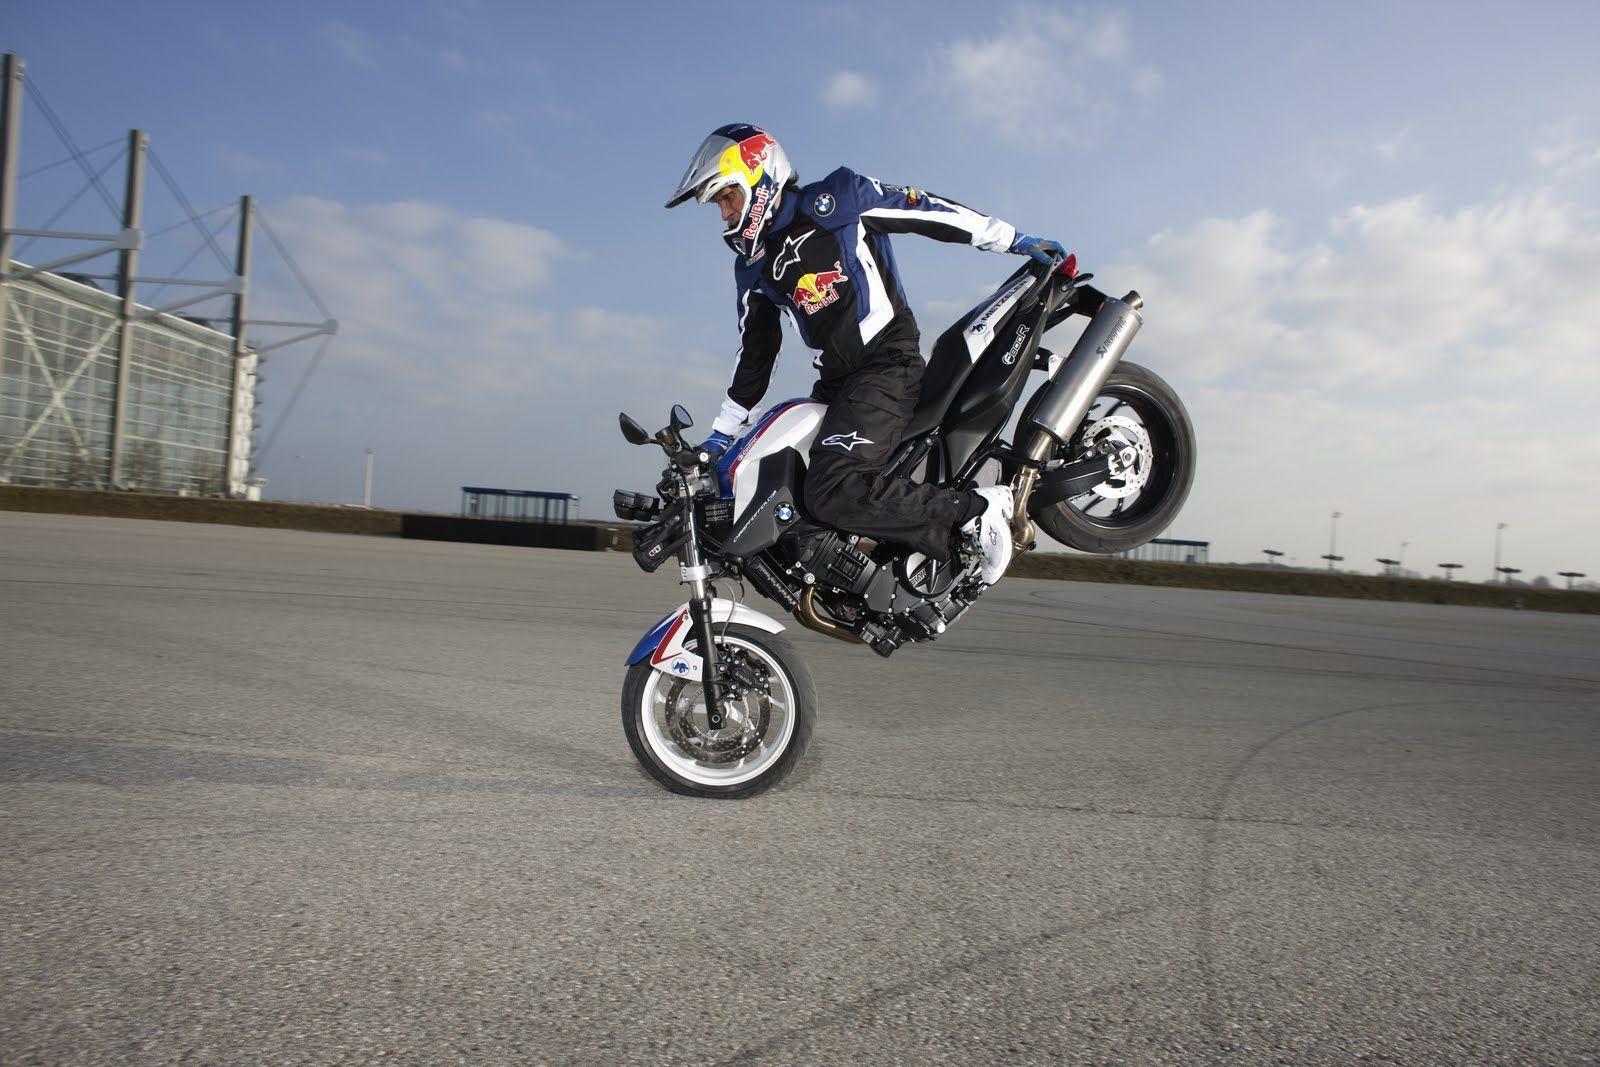 Dangerous Bike Stunt In 2017 Hd Wallpapers Wallpaper Cave